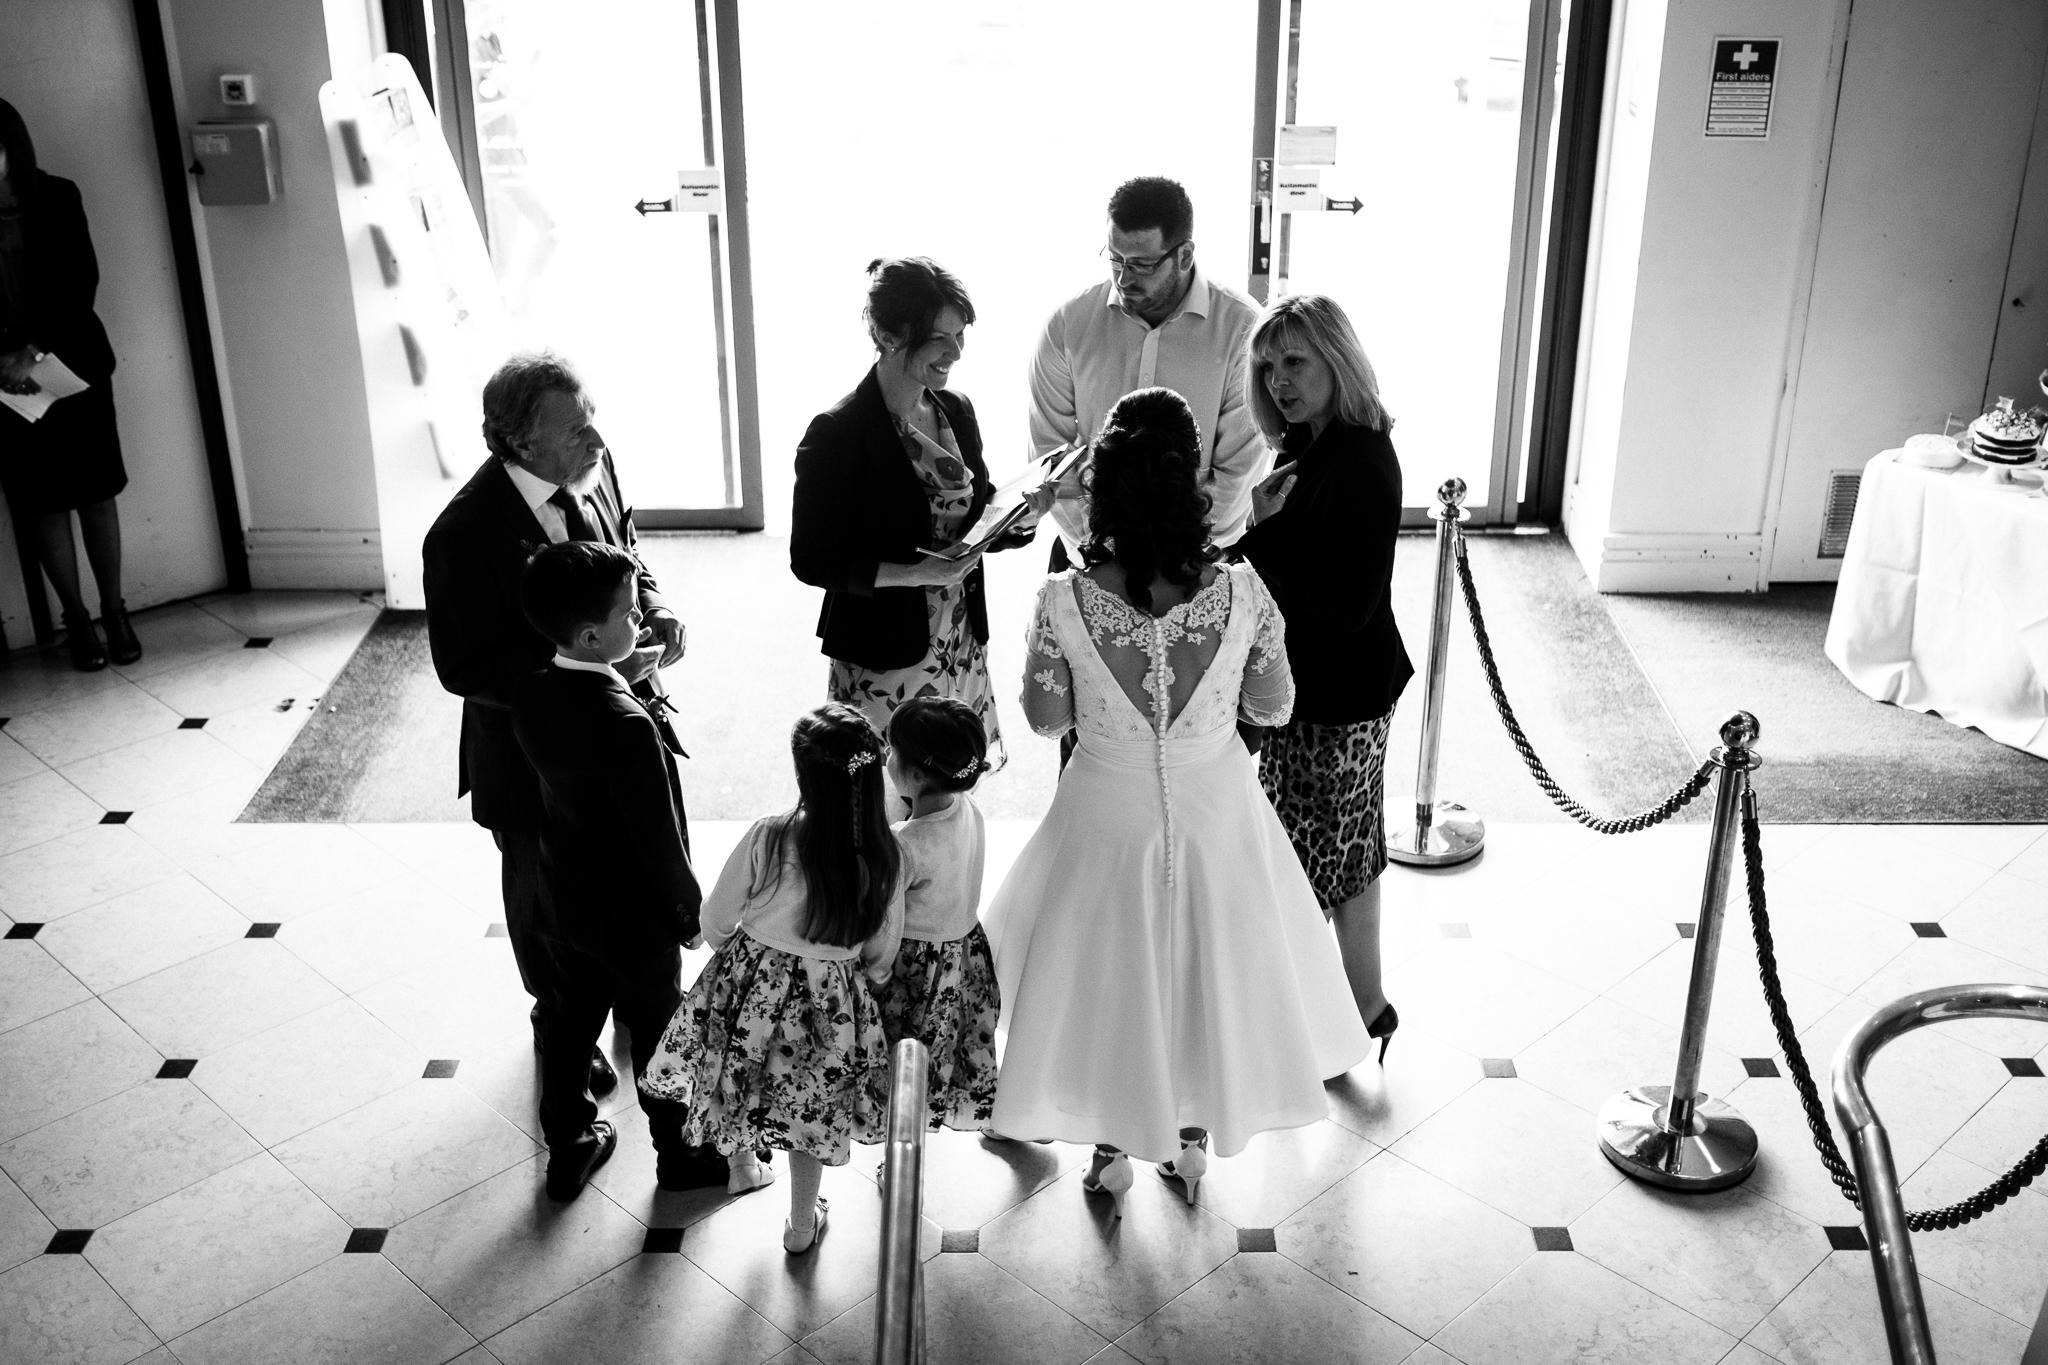 Cheshire Wedding Photography at Crewe Lyceum Theatre Stage Wedding Art Deco 20s - Jenny Harper-14.jpg